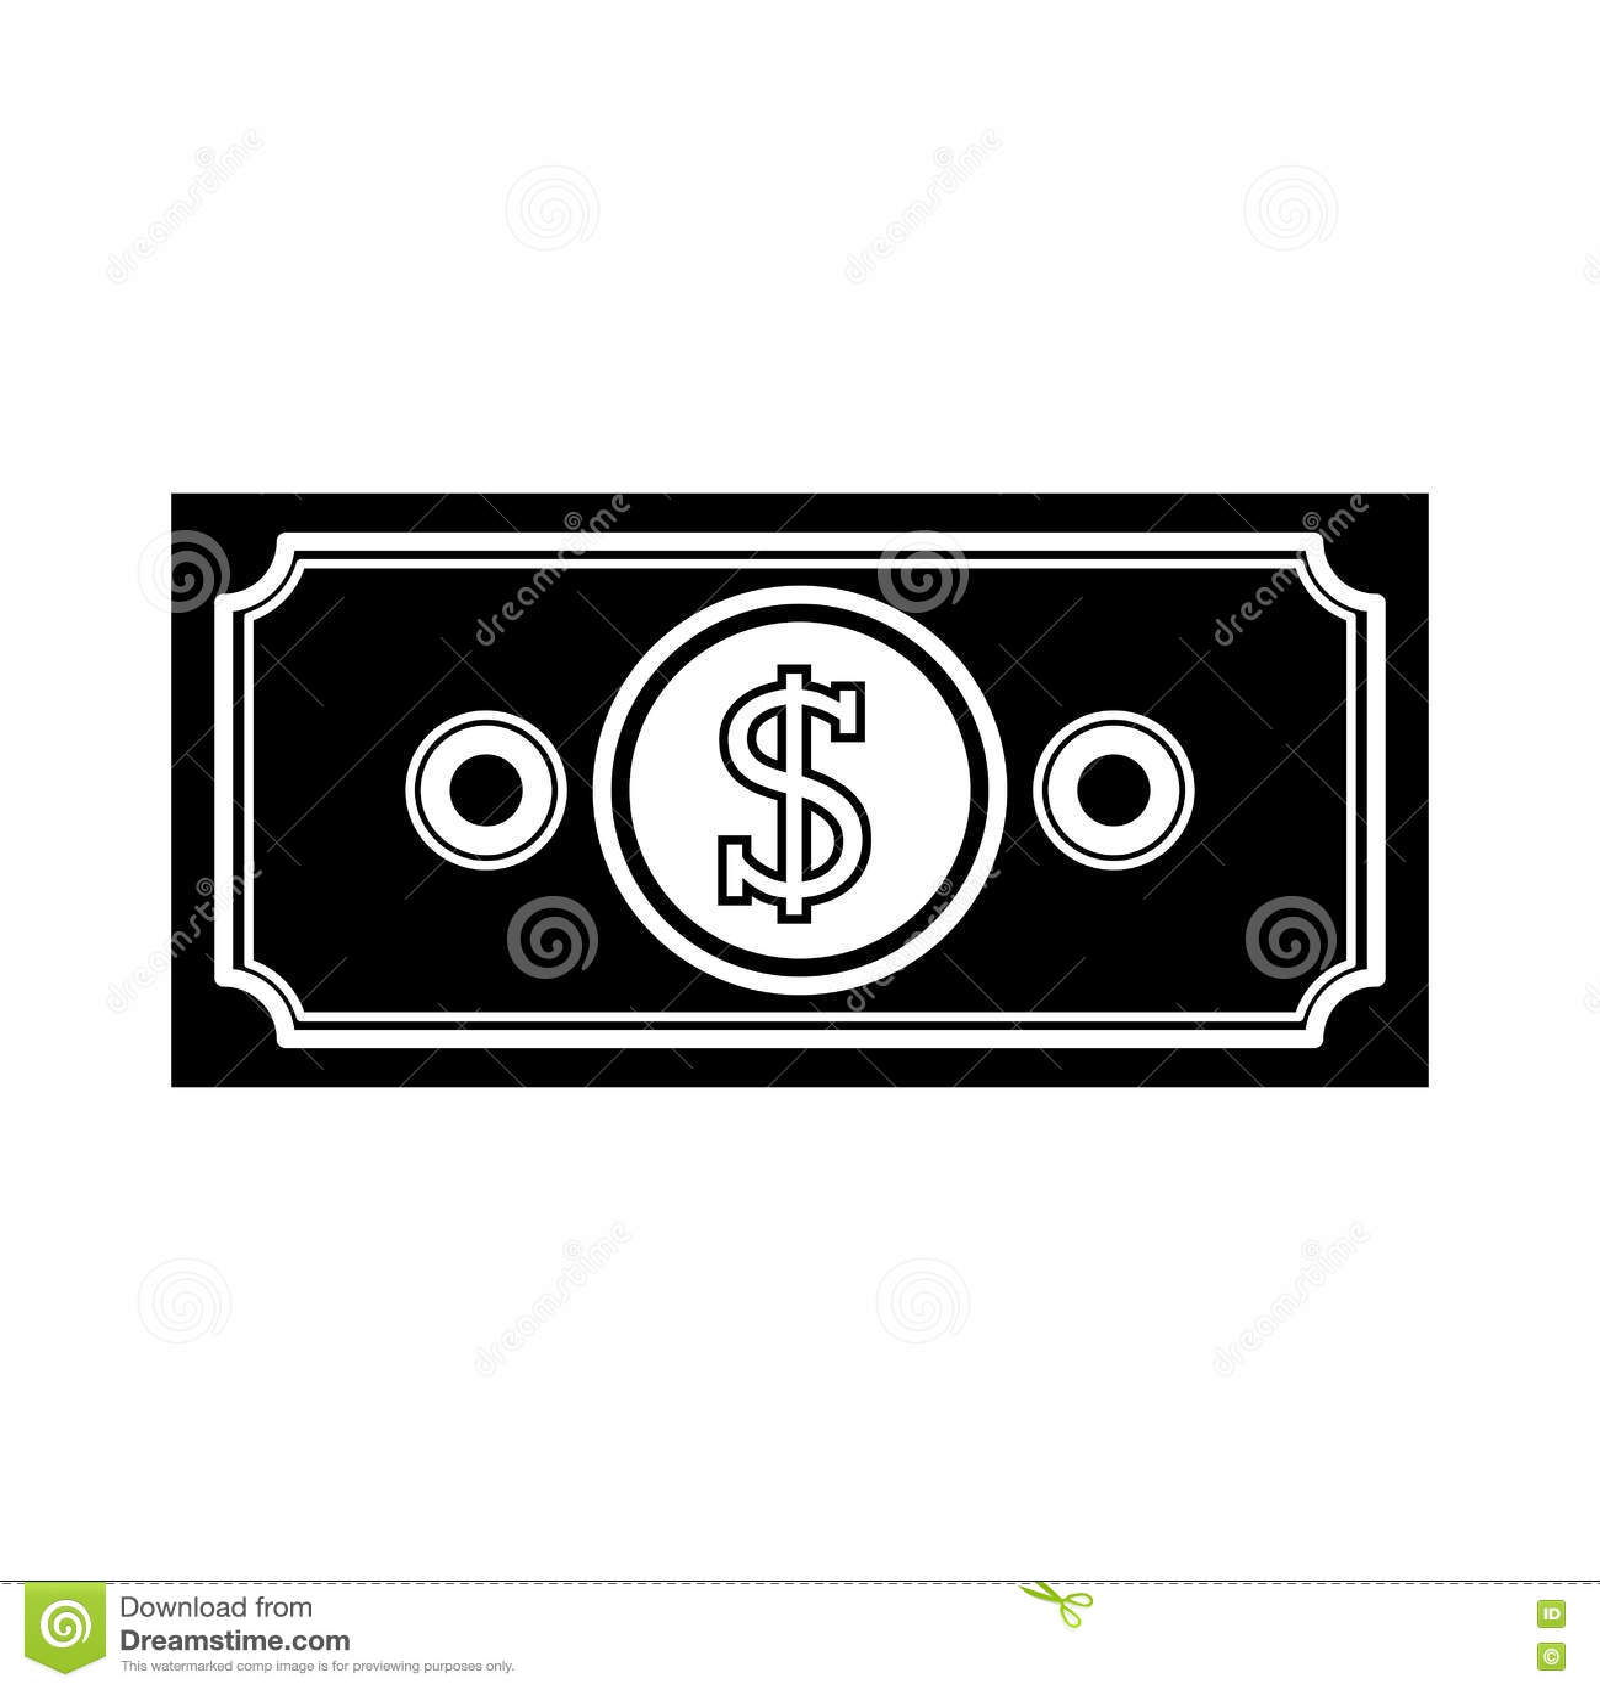 Boleto monocromático con símbolo del dinero